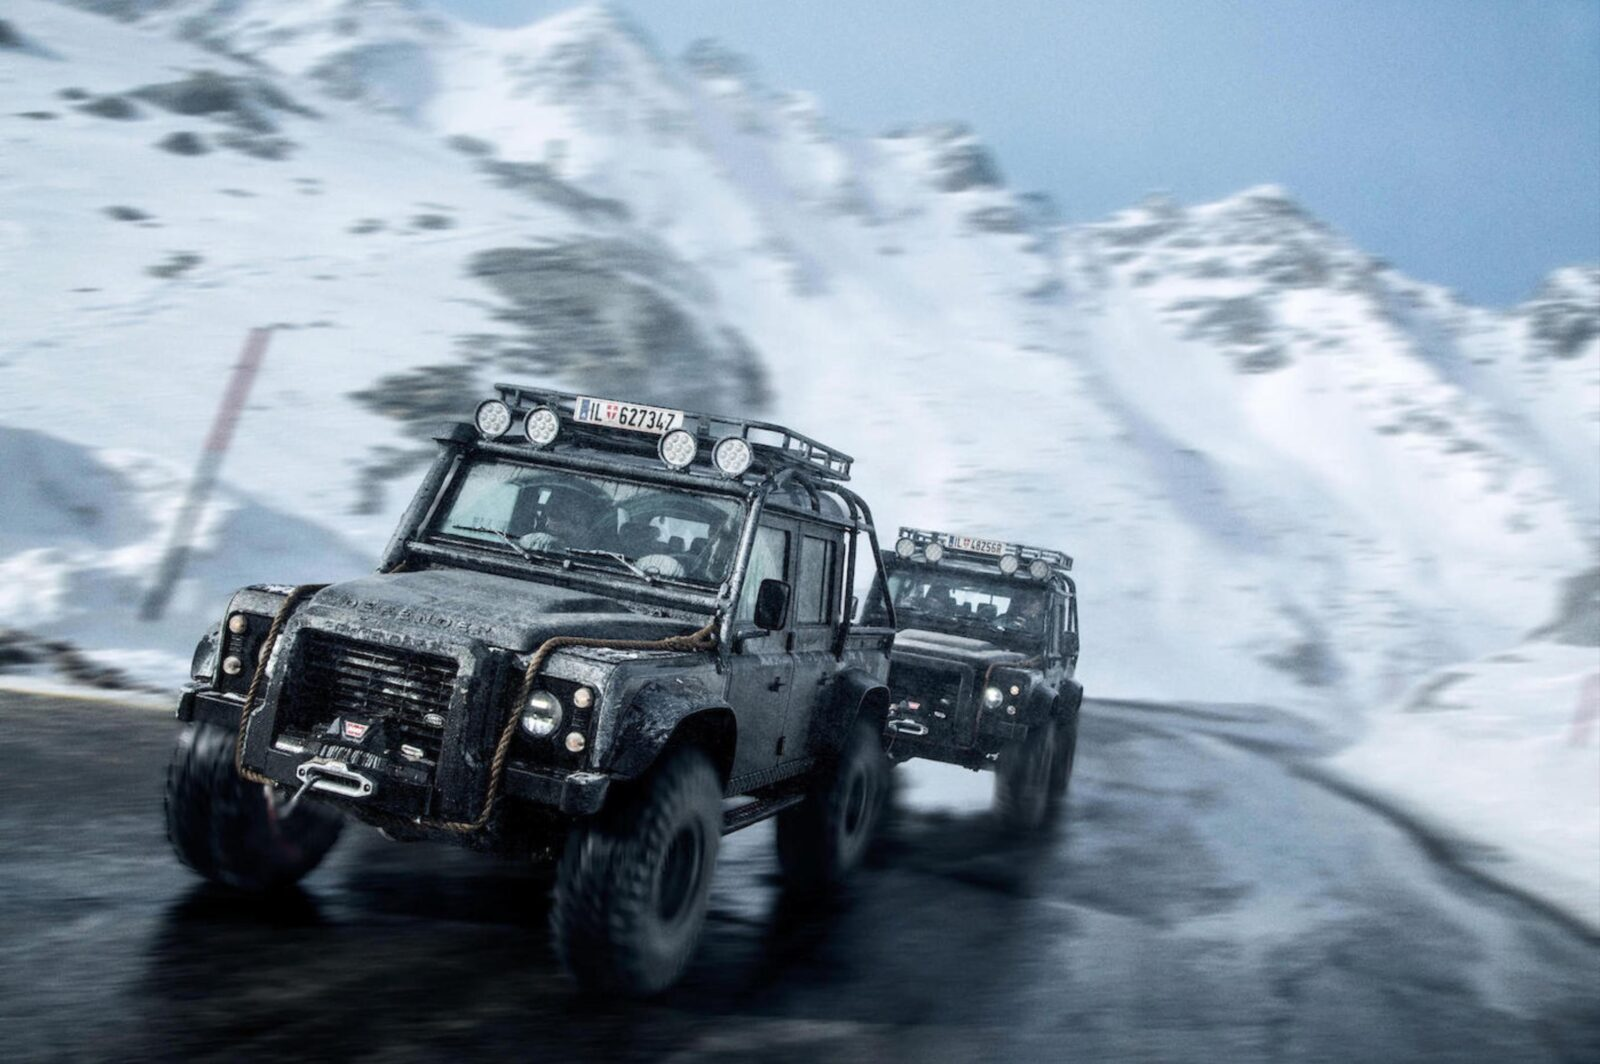 Pajero Car Hd Wallpaper The James Bond Quot Spectre Quot Land Rover Defender Svx